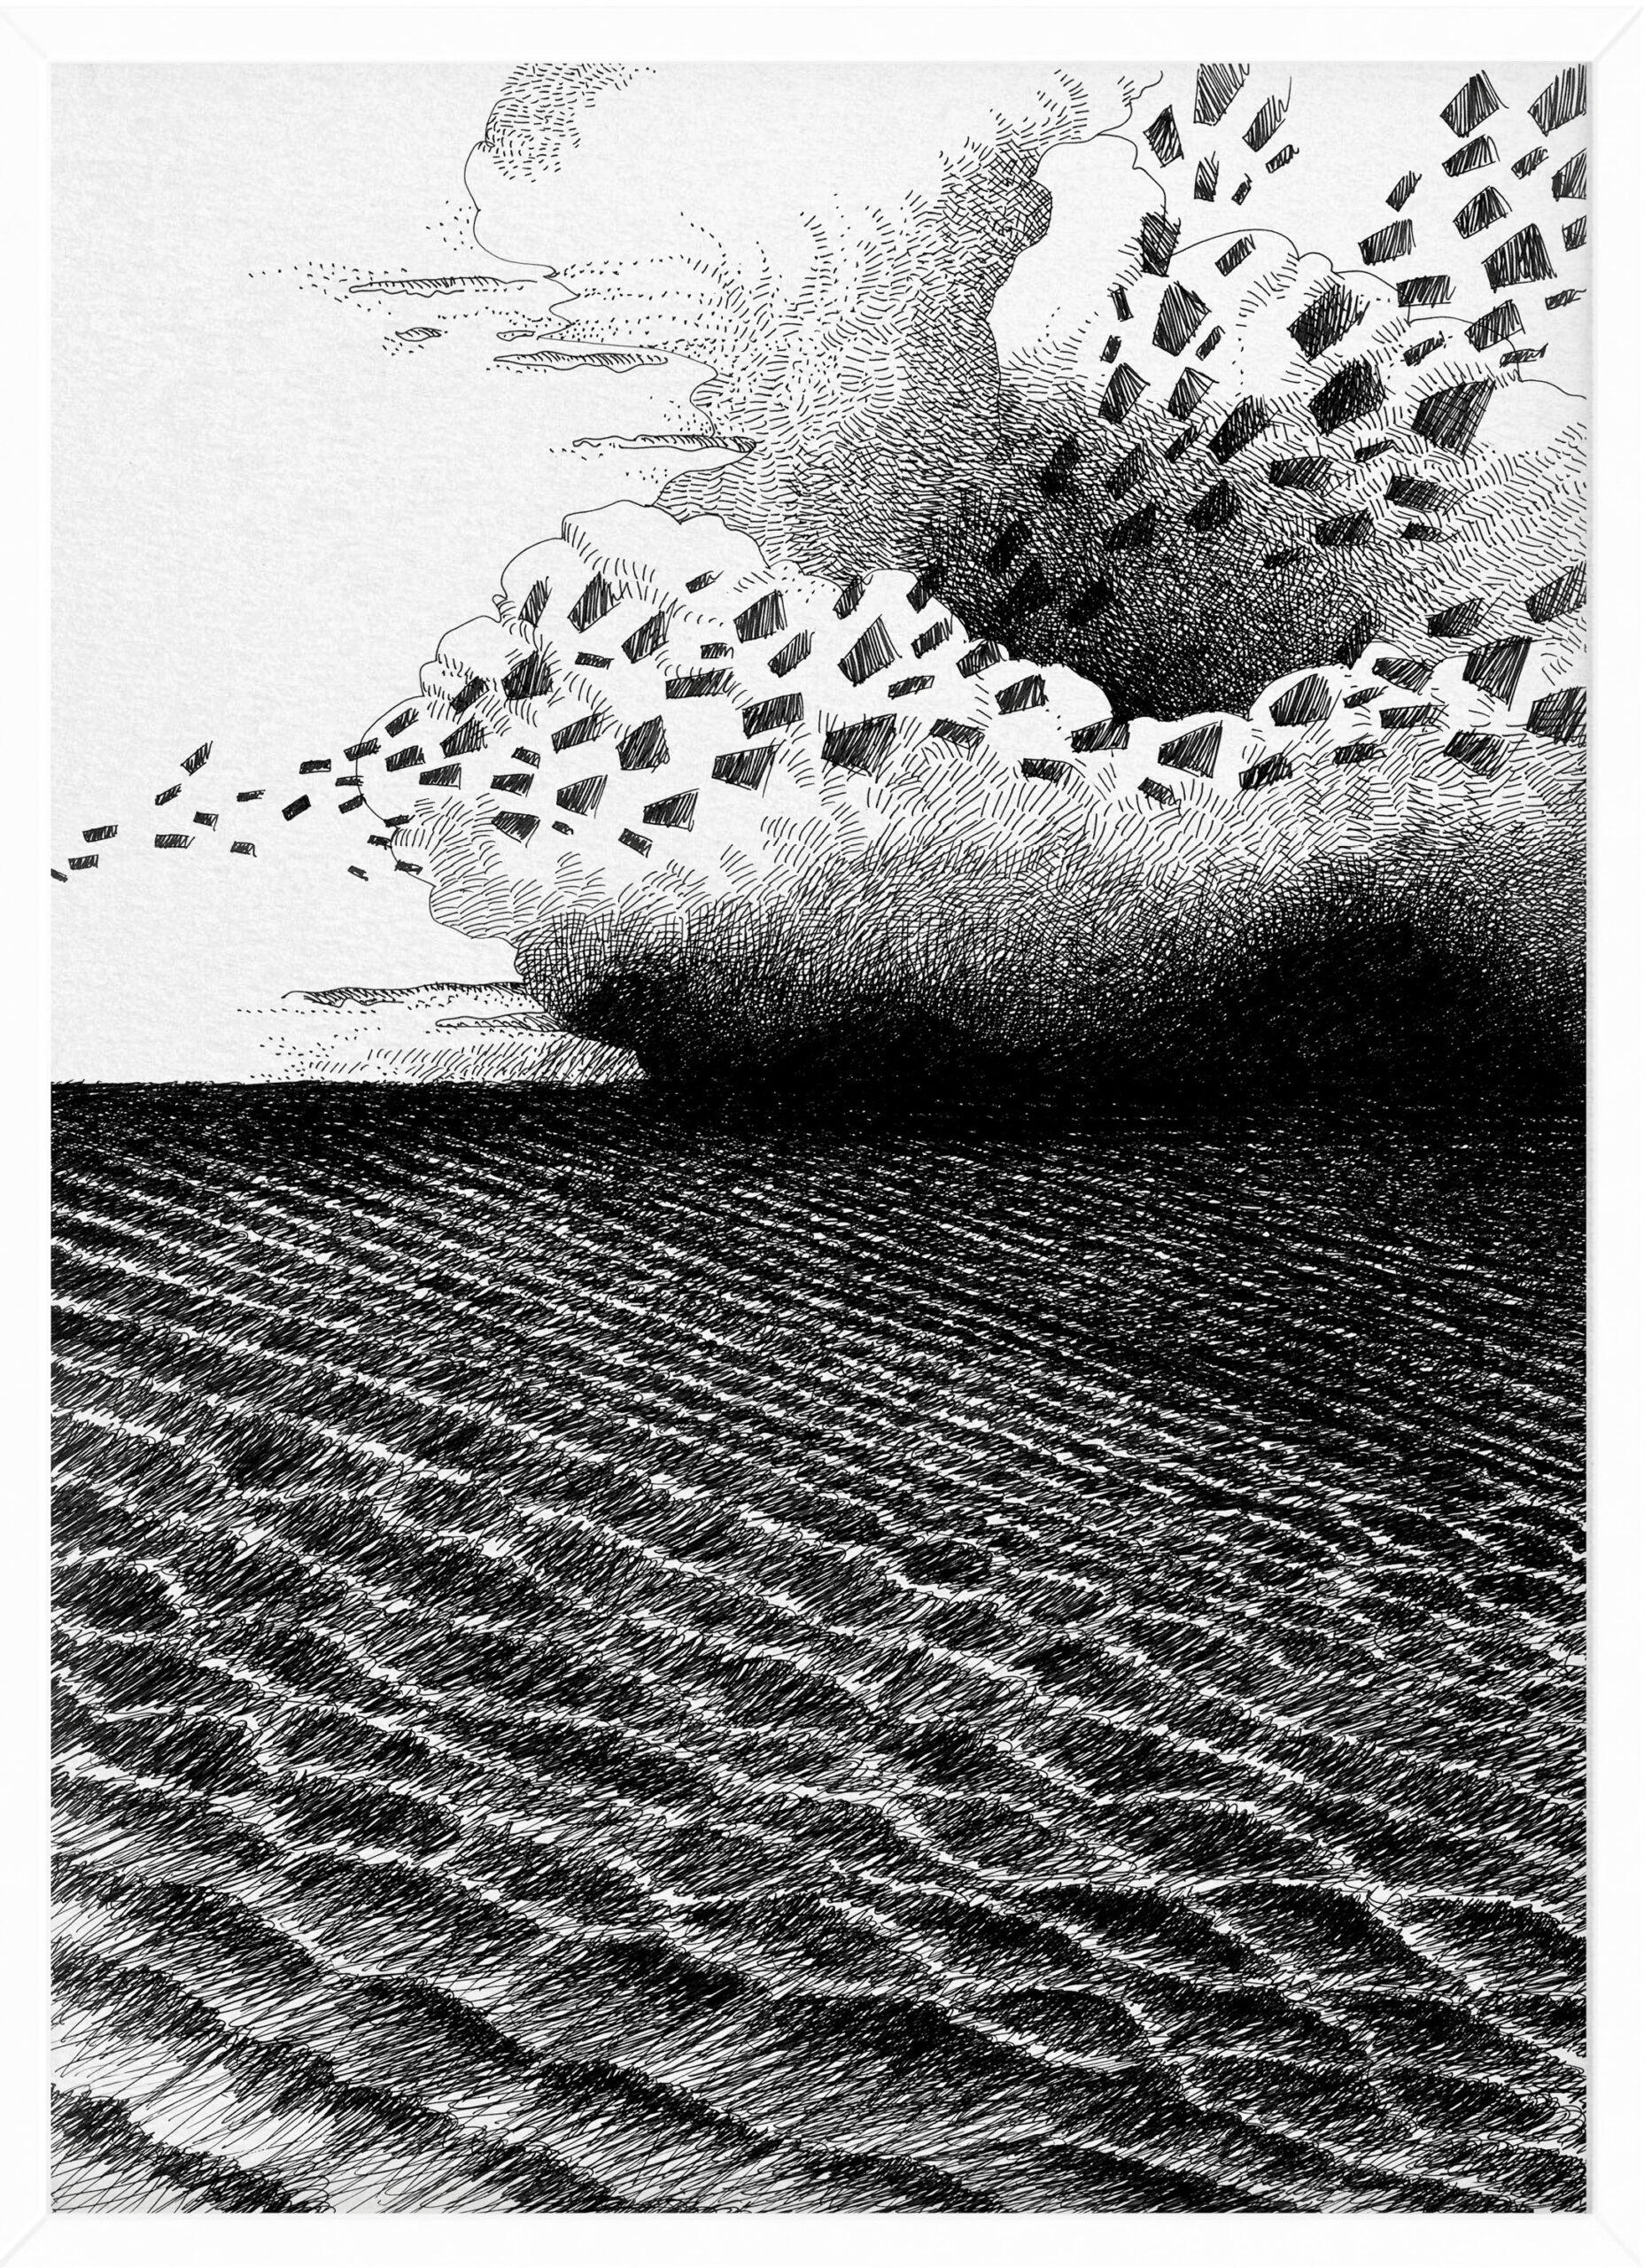 Radical | Drawings | Mario Trimarchi Design5